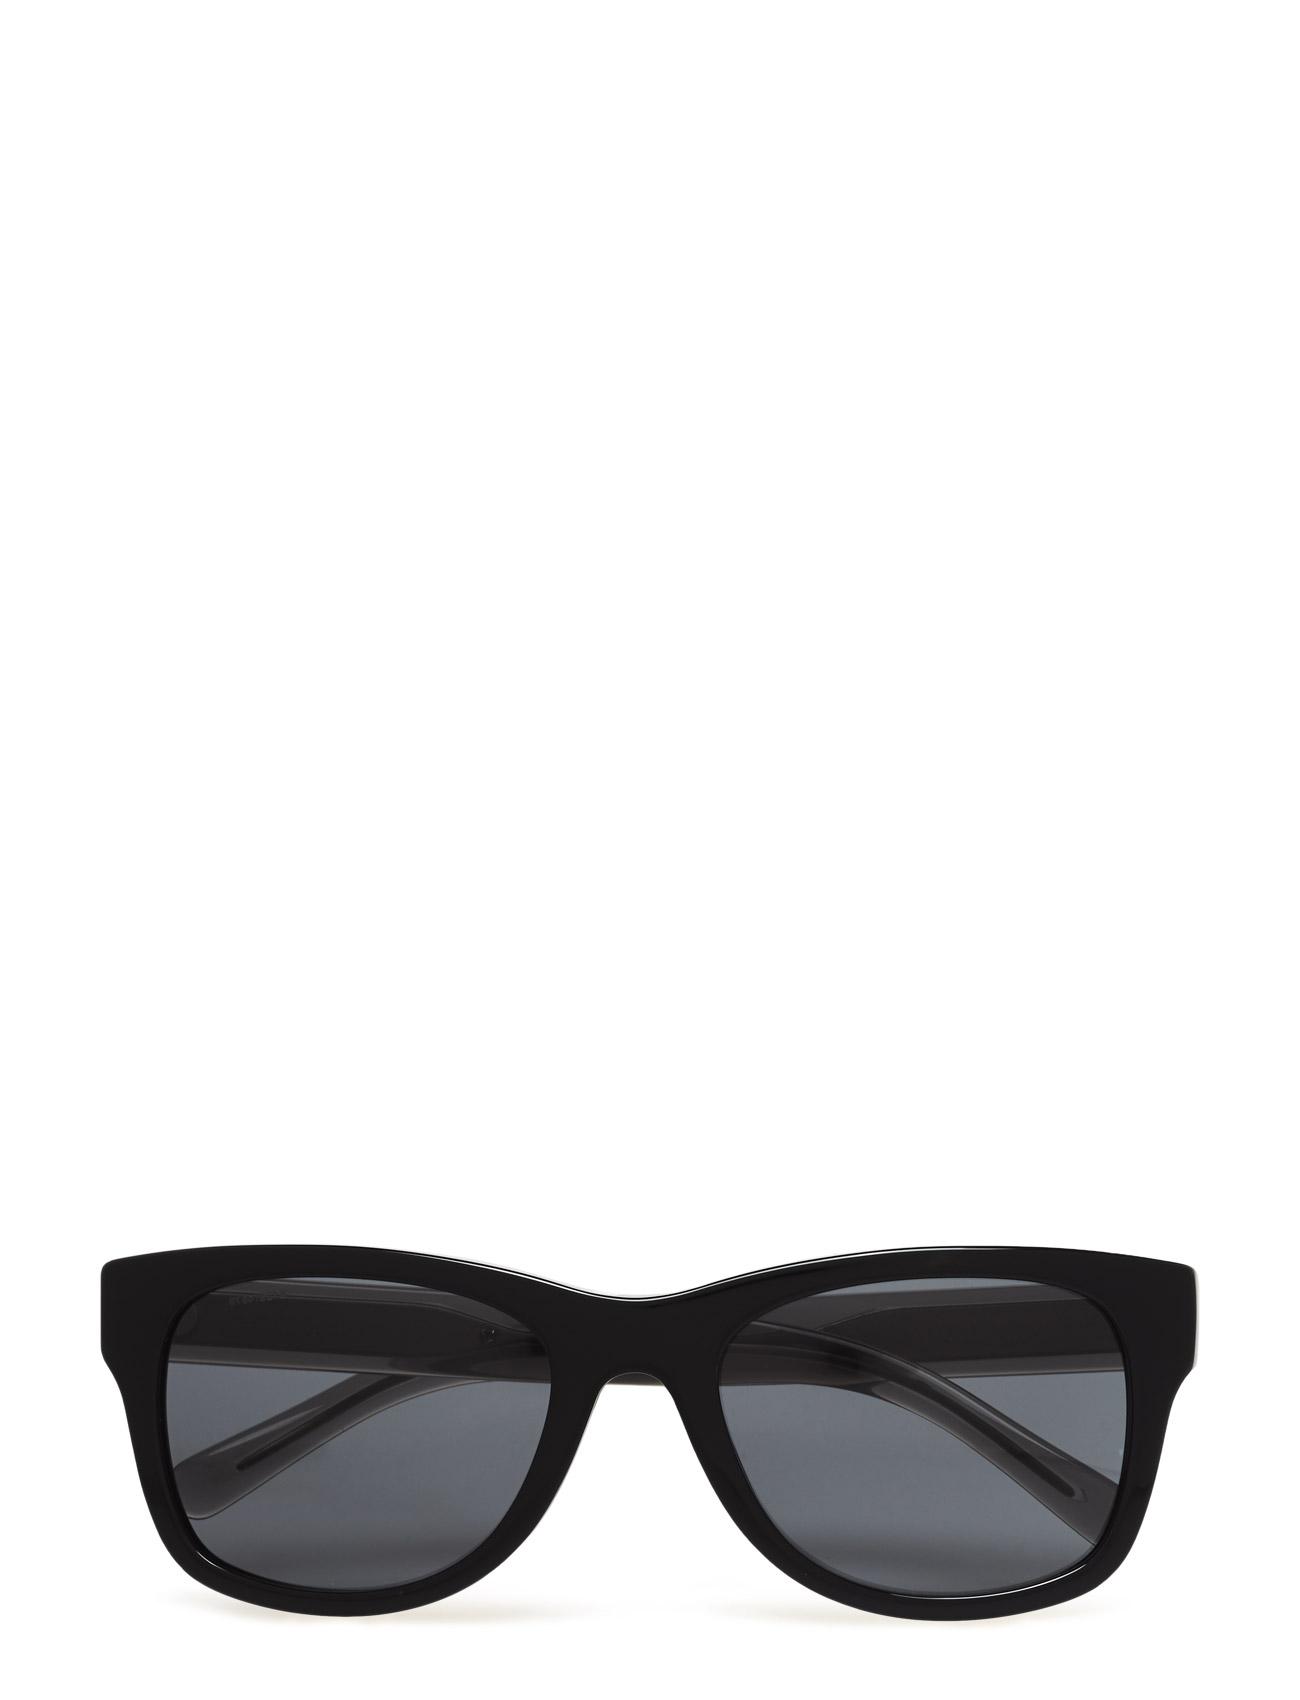 Acoustic | Check Core Burberry Sunglasses Solbriller til Herrer i Sort